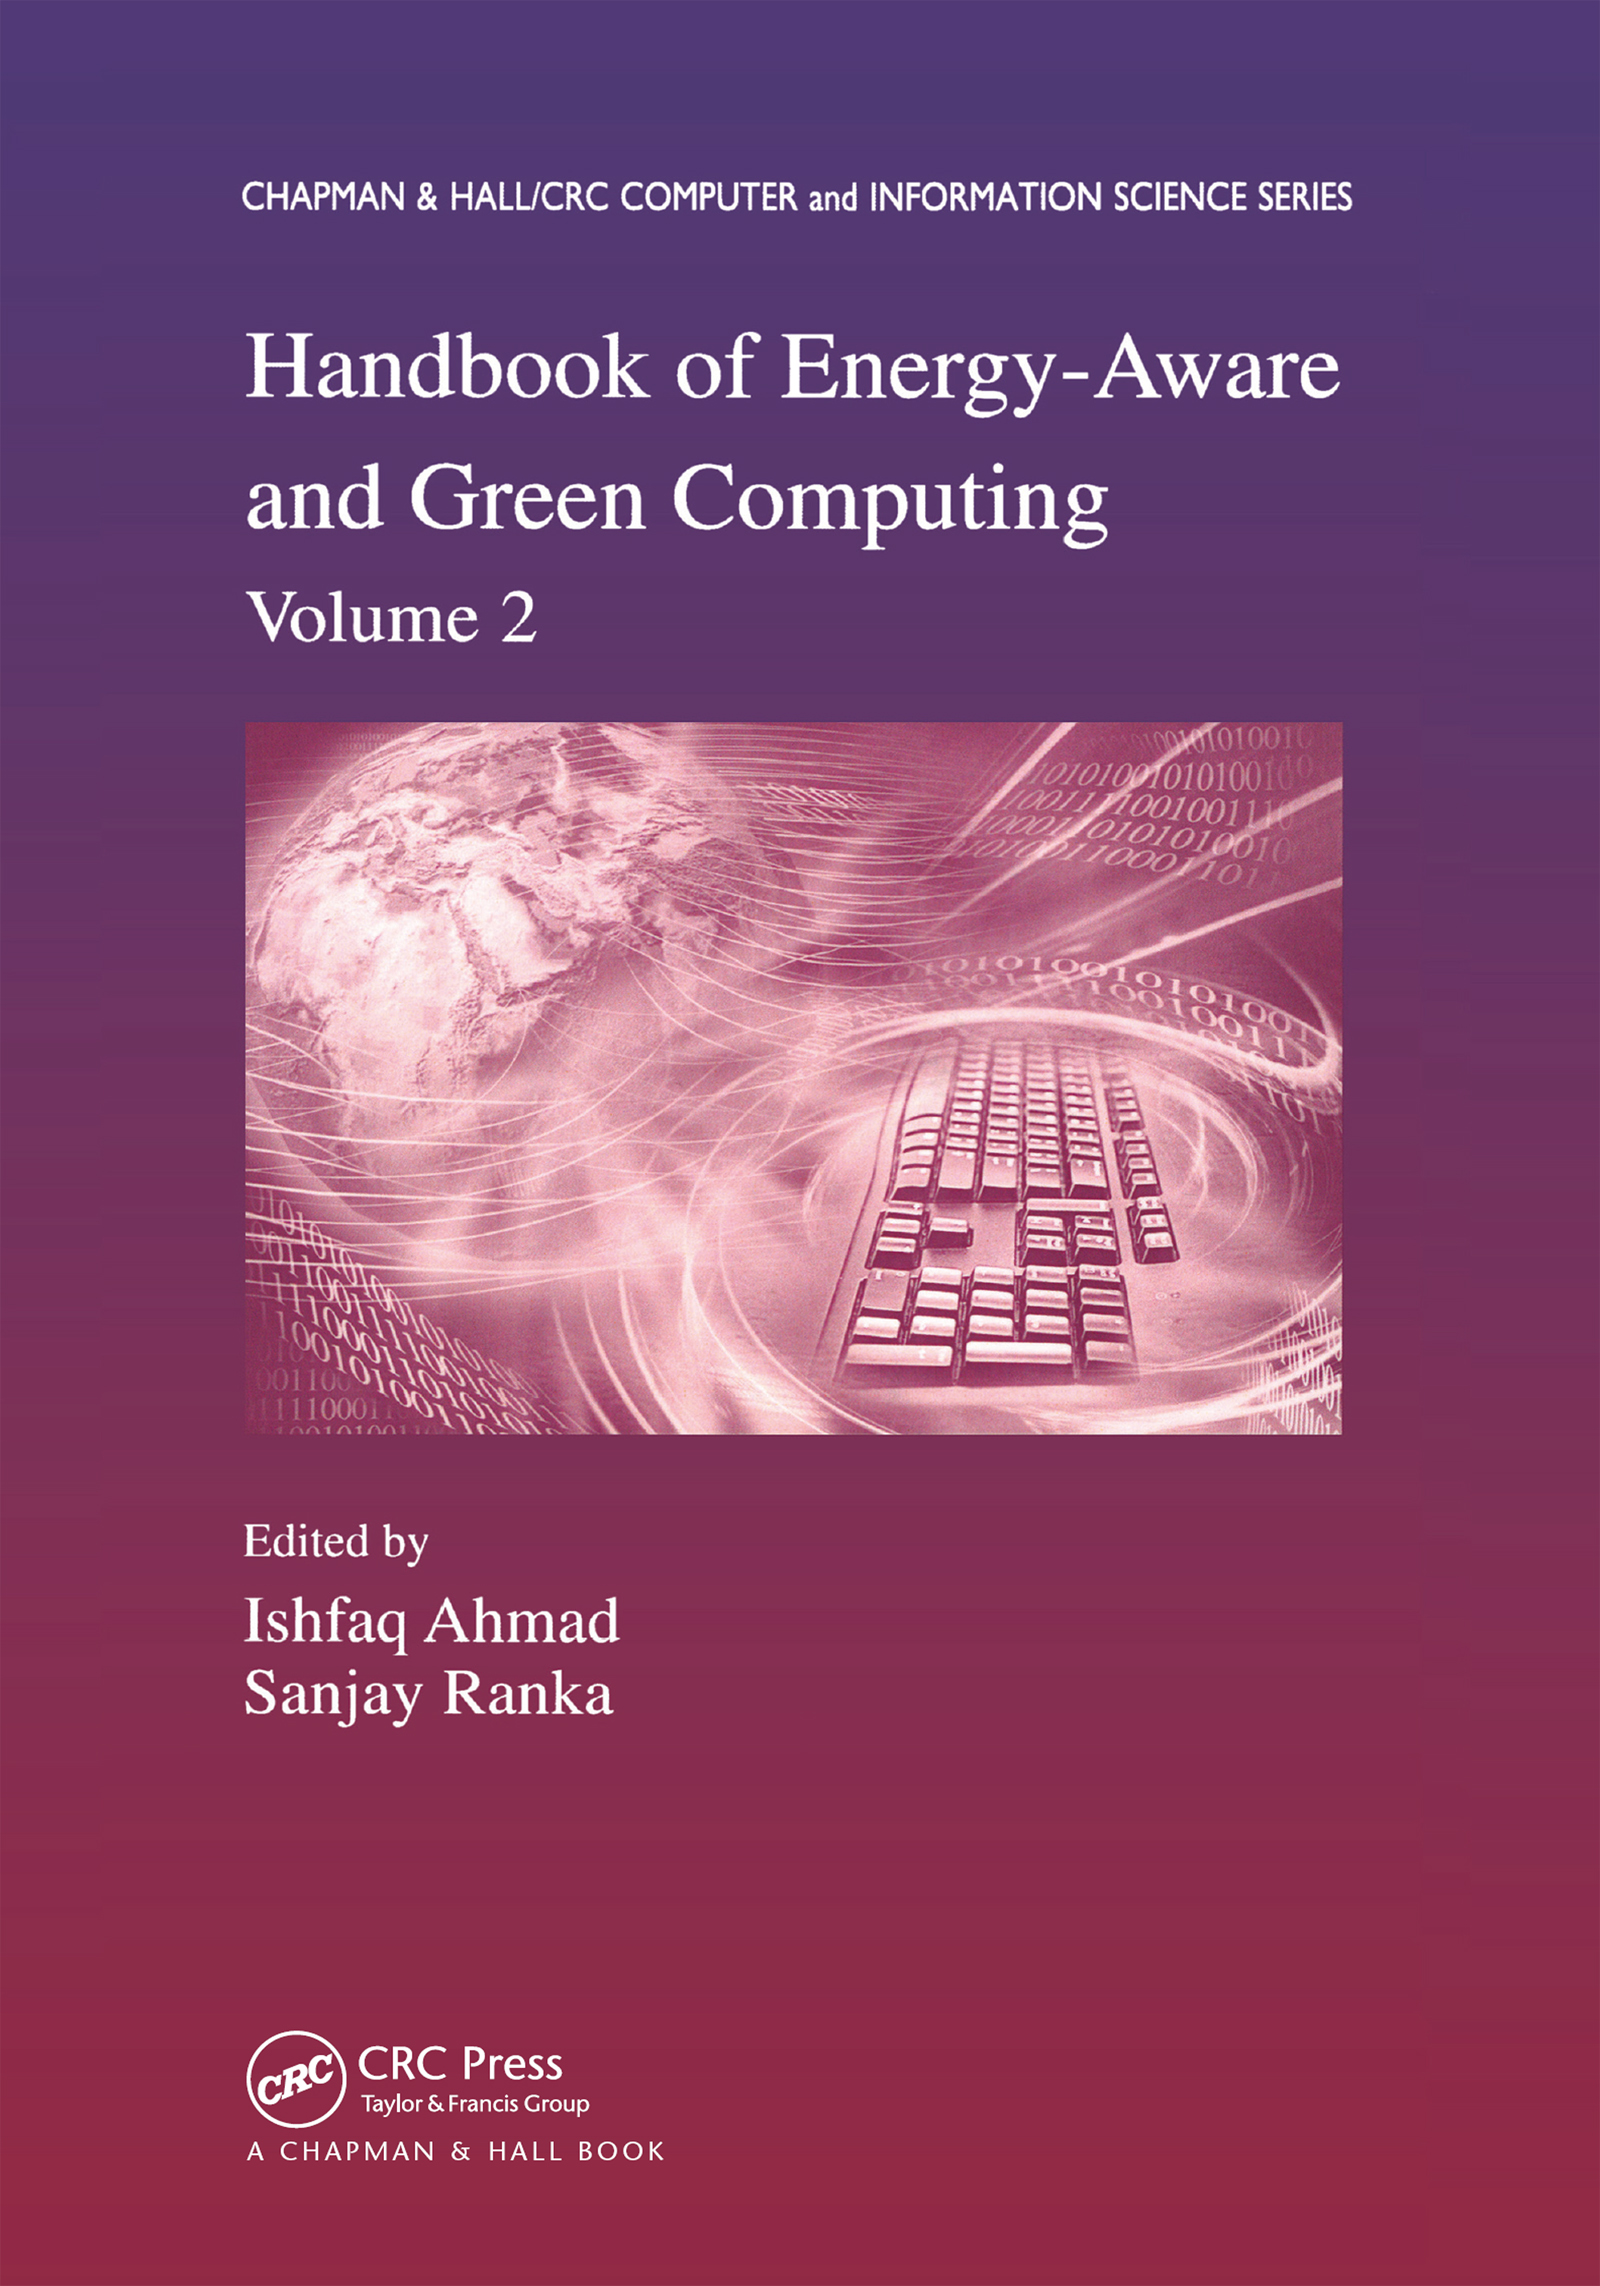 Handbook of Energy-Aware and Green Computing, Volume 2